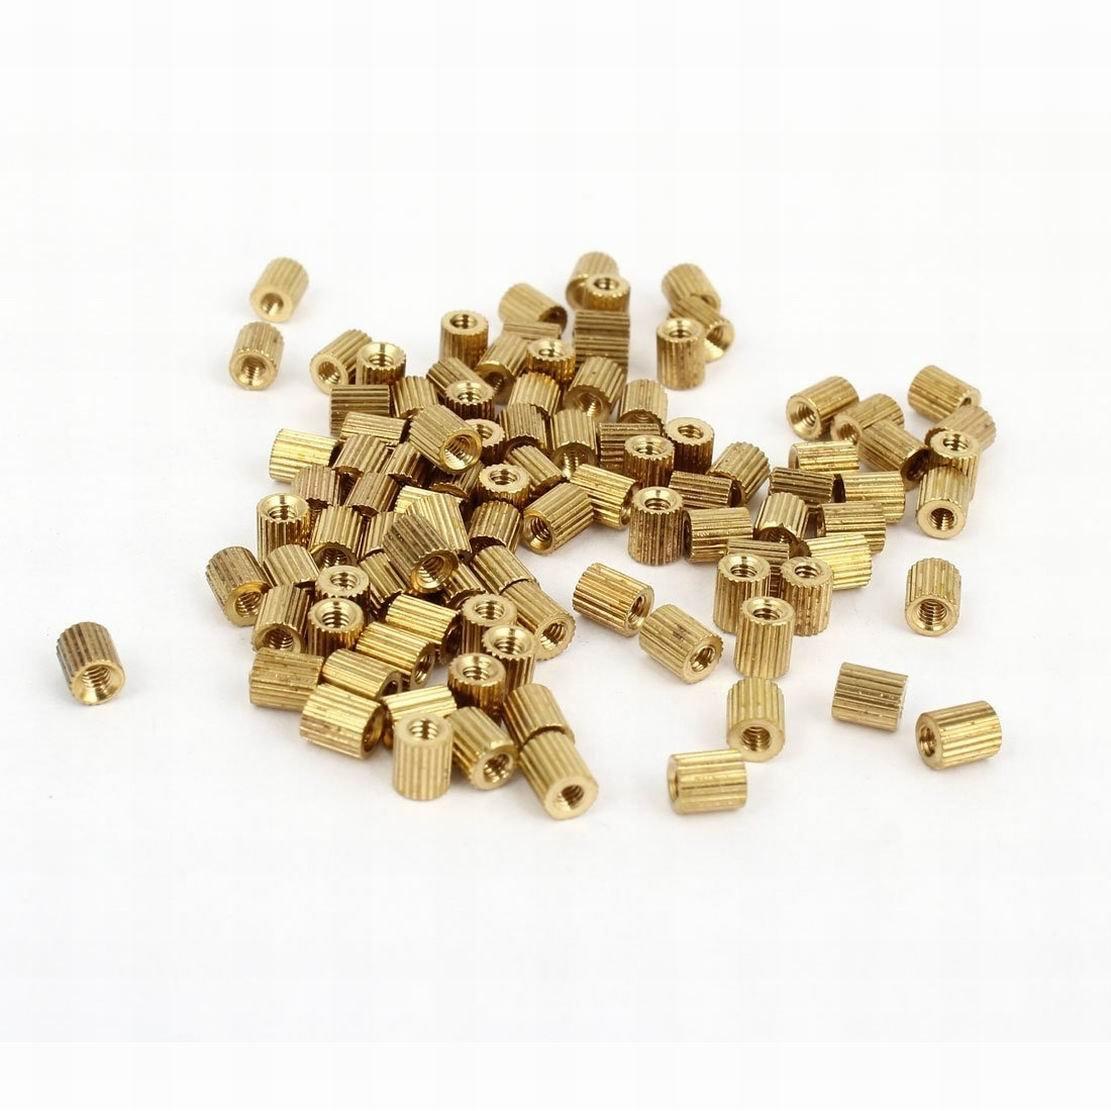 100 Pcs Female Threaded Pillars Brass Standoff Spacer Gold Tone M2x5mm